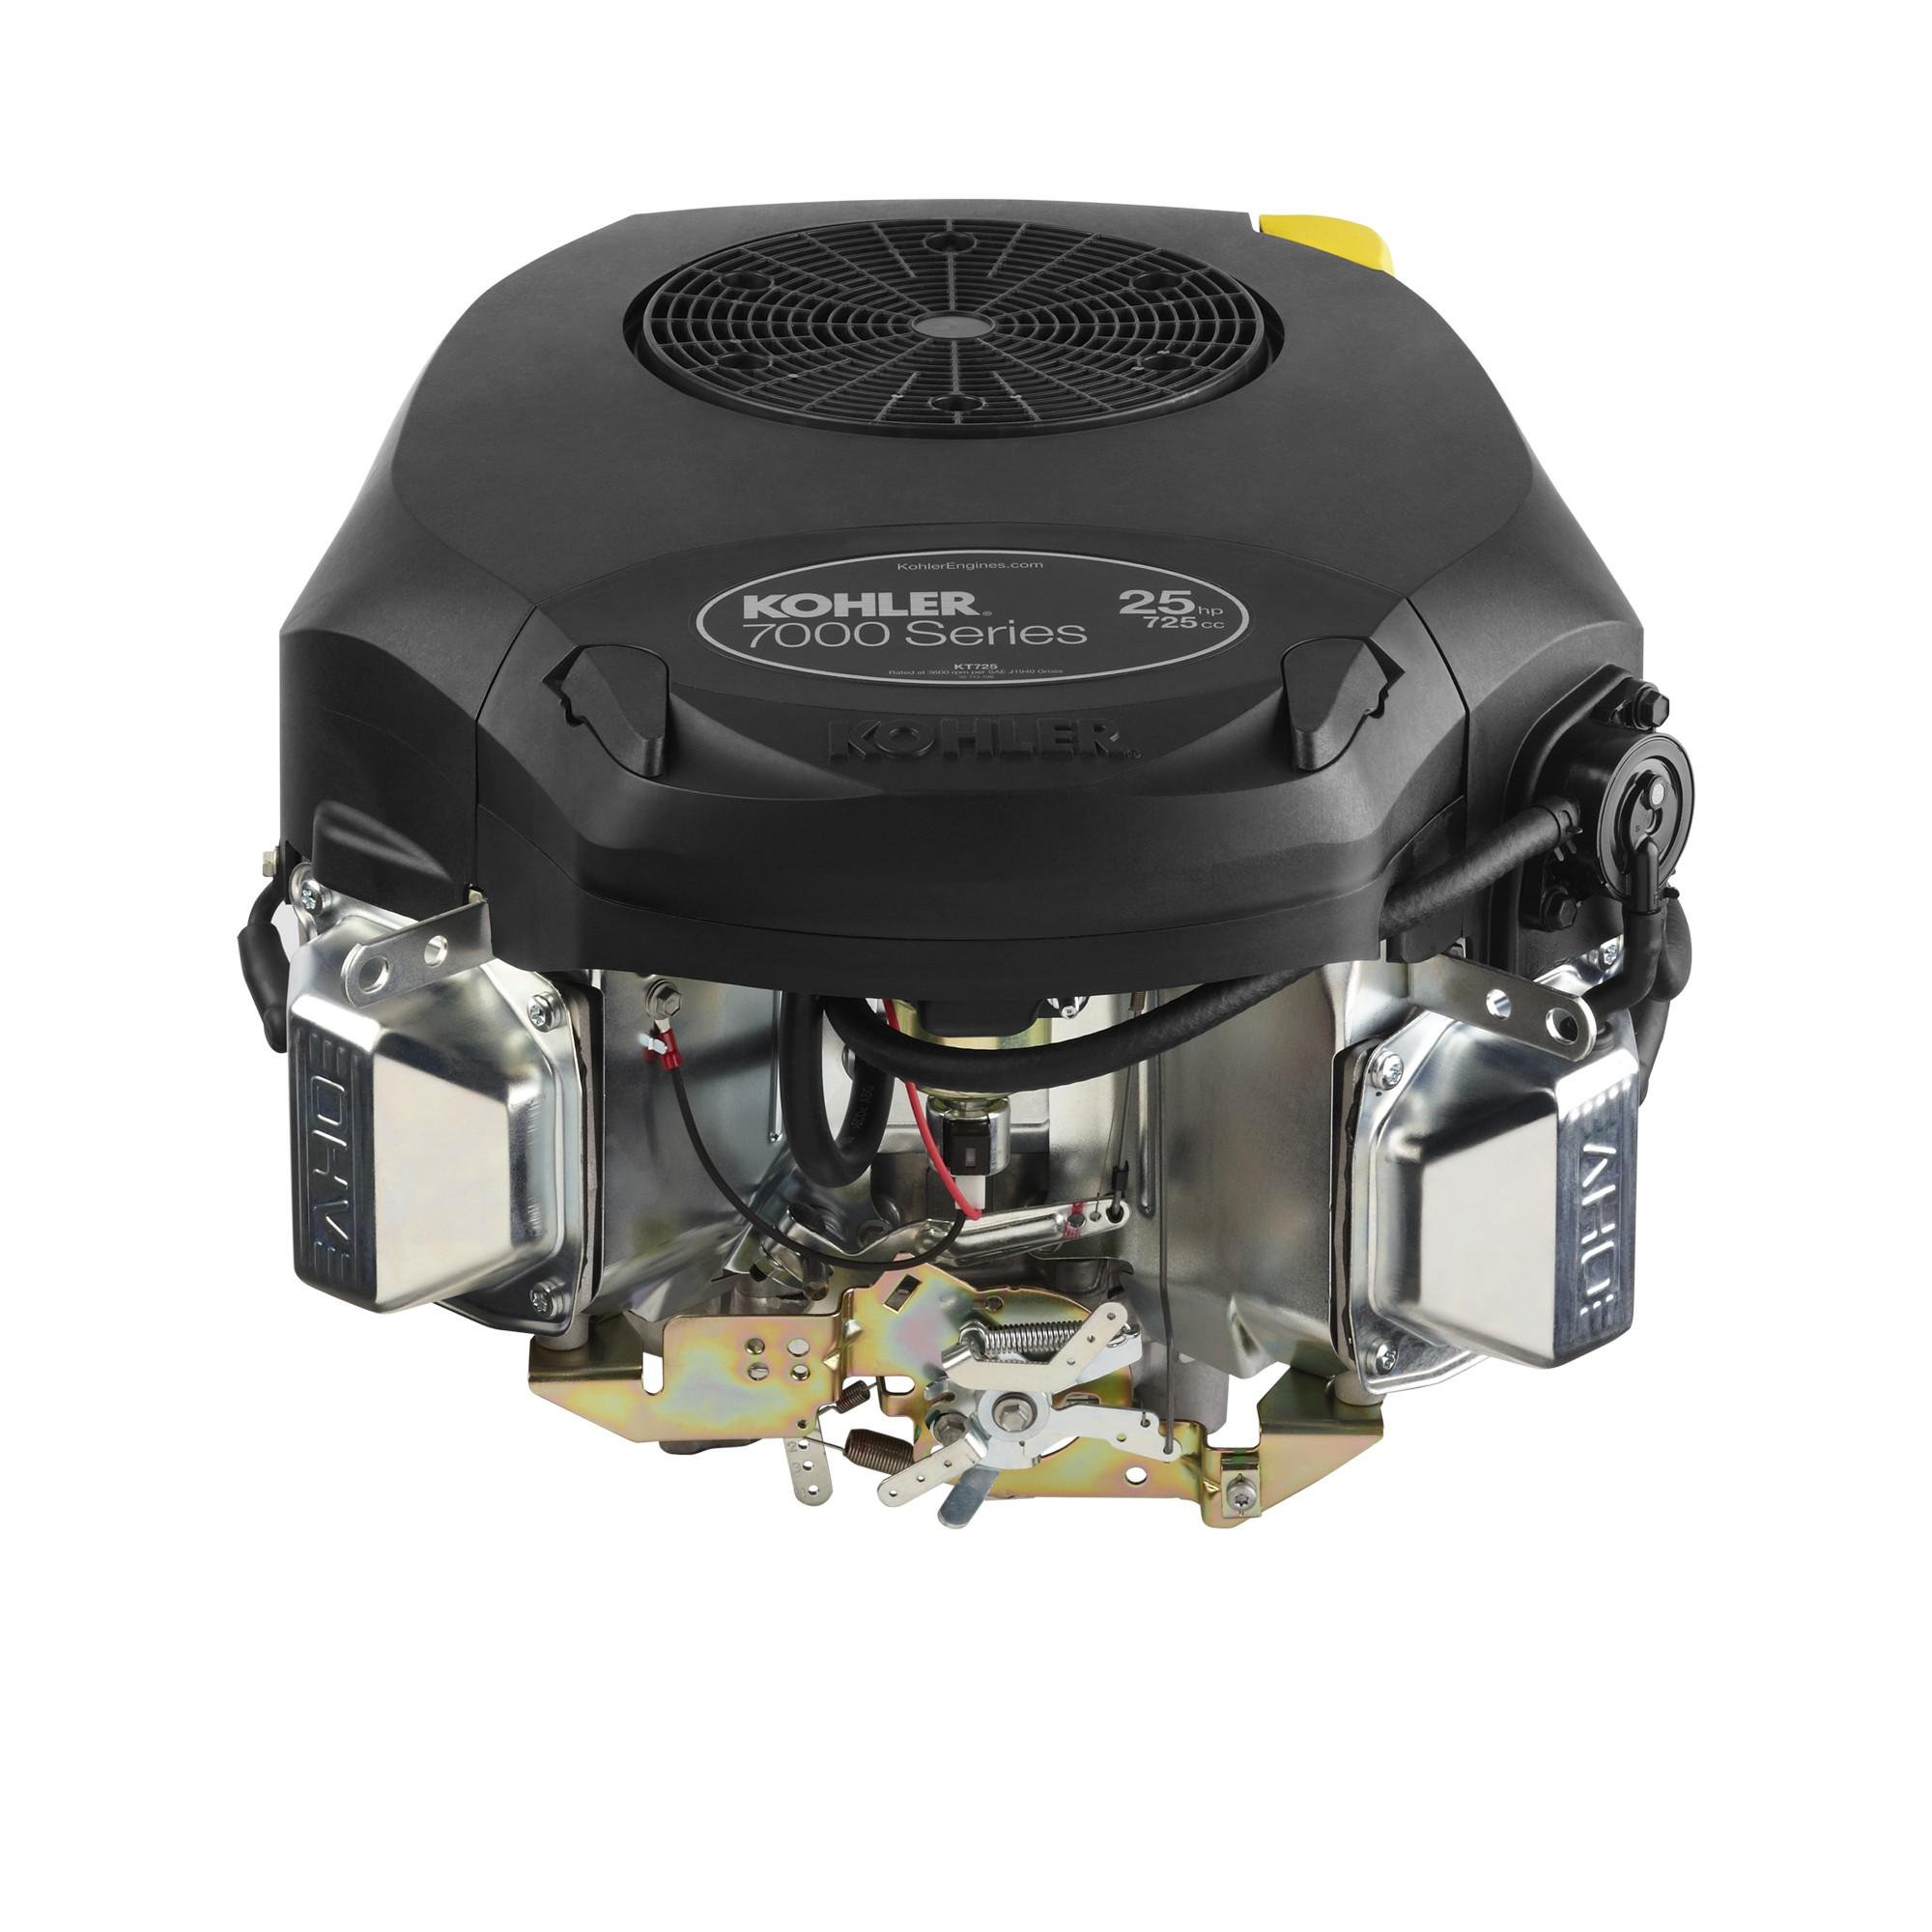 kohler engines kt735 7000 series product detail engines kohler marine generator wiring diagram kohler 7000 generator wiring diagram [ 2000 x 2000 Pixel ]